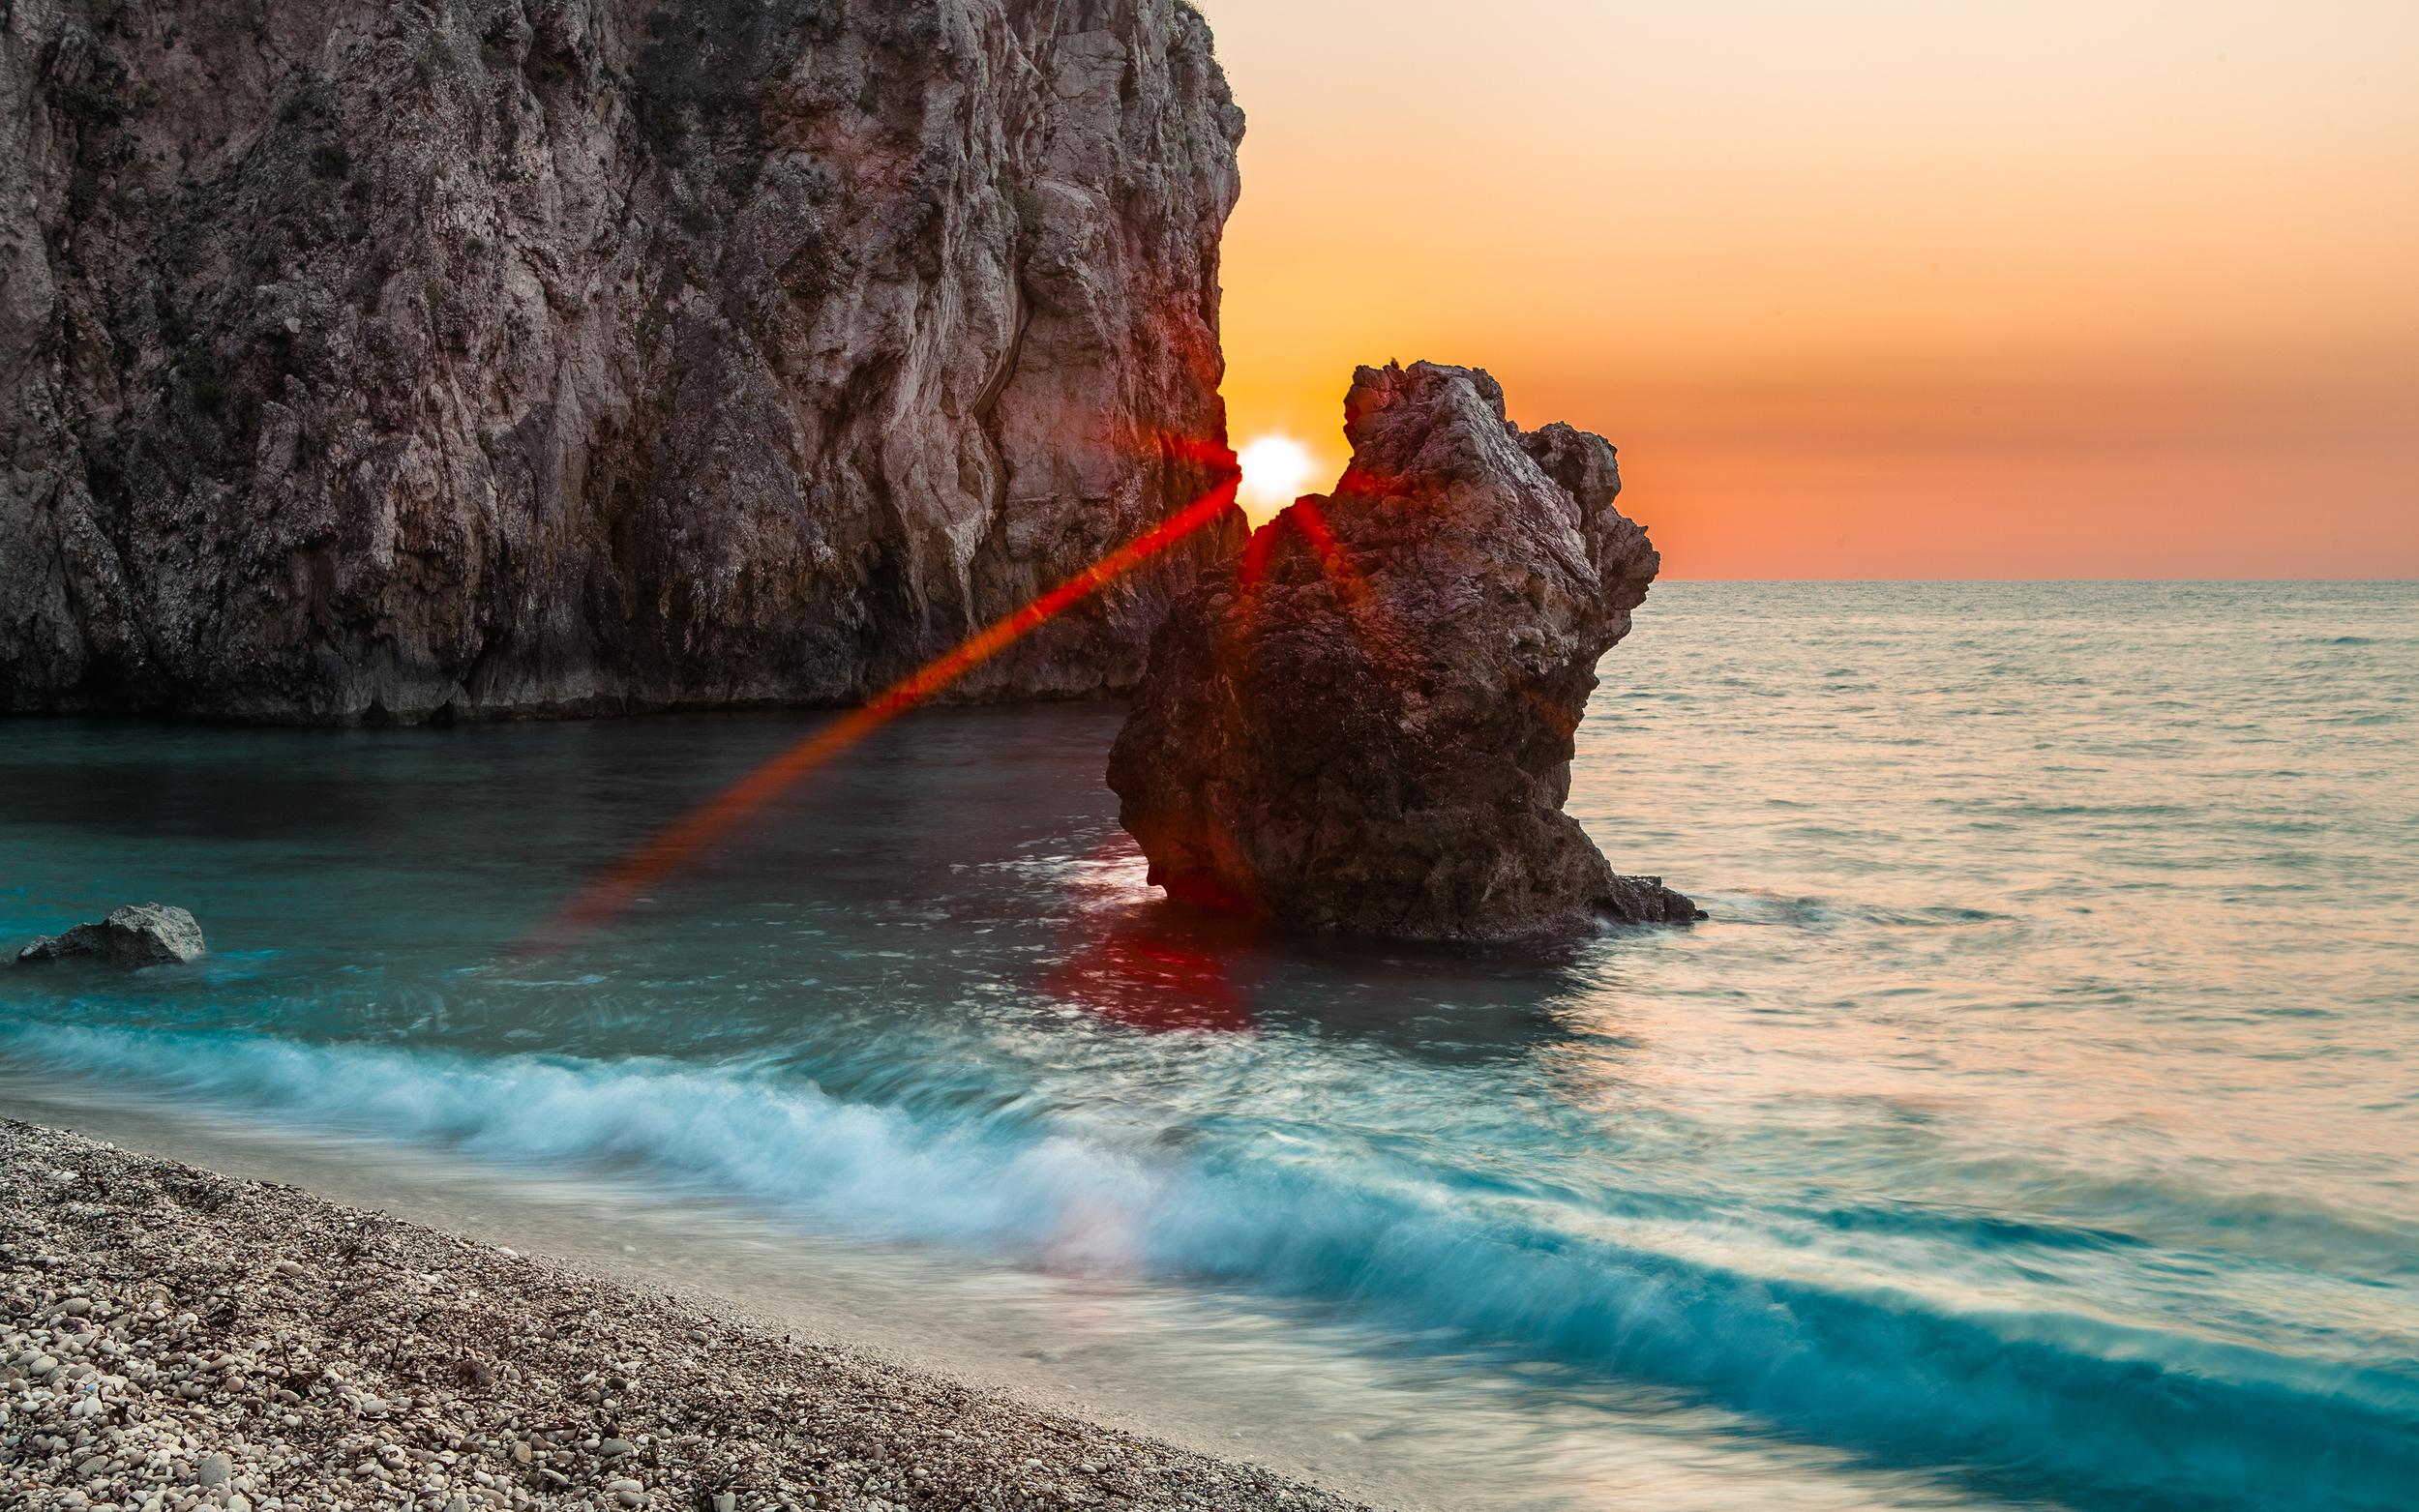 Nature___Sundown_Sunset_on_the_island_of_Lefkada_065254_.jpg